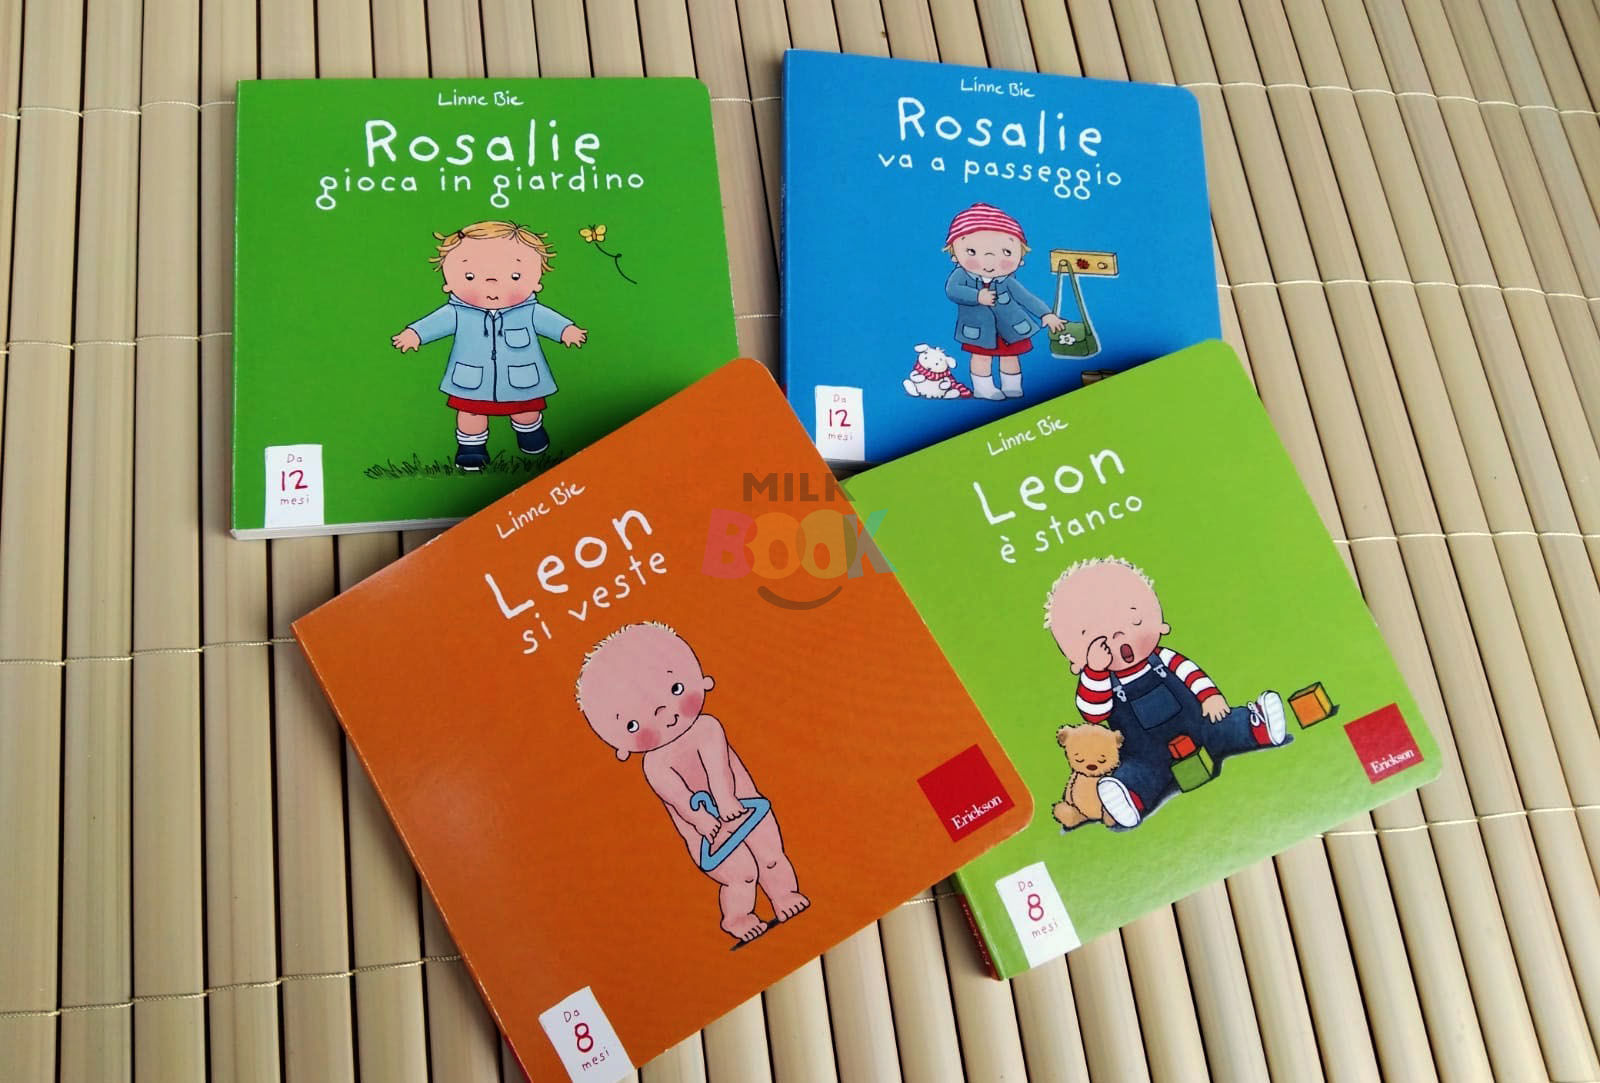 I libri per bambini piccoli di Linne Bie